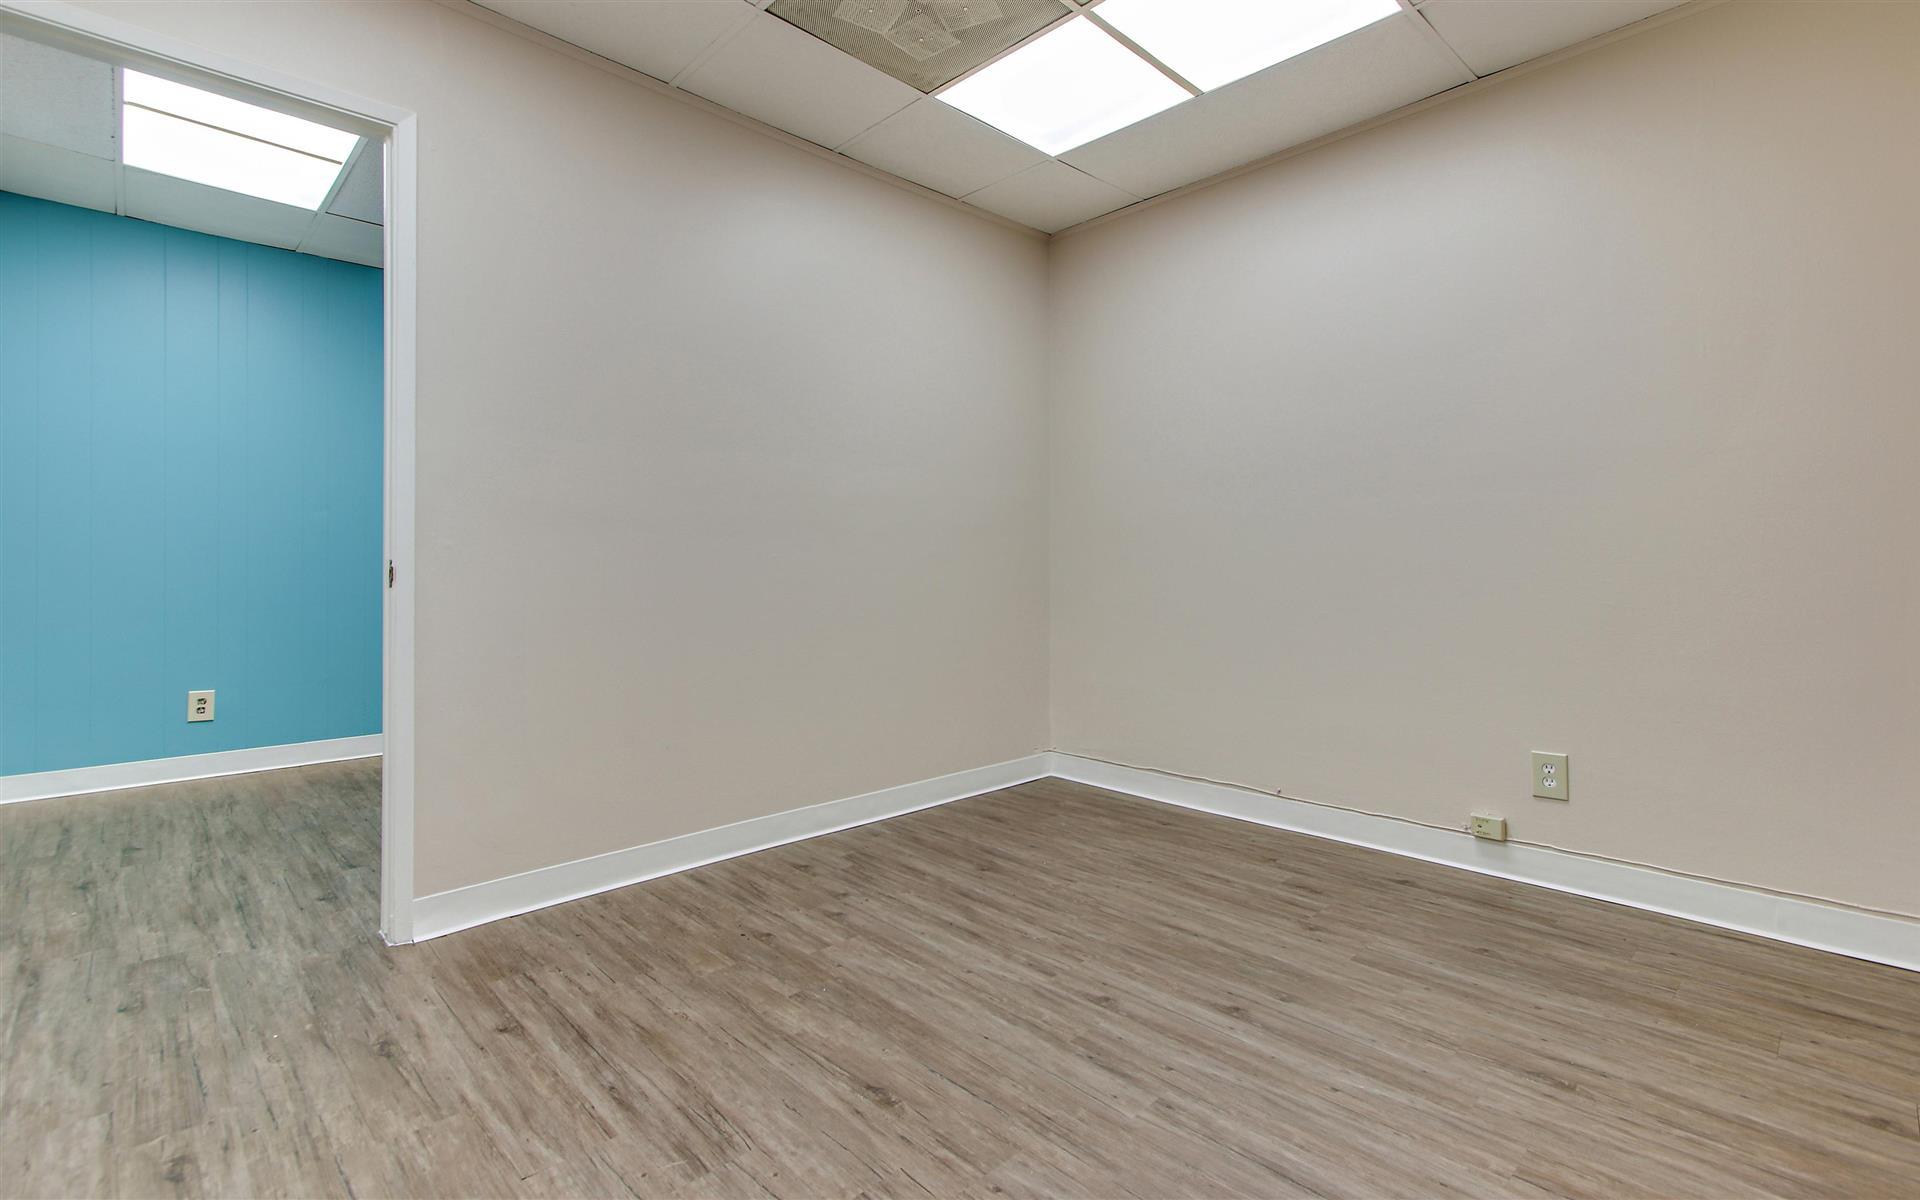 16200 Ventura Blvd. - Private Office Suite 420